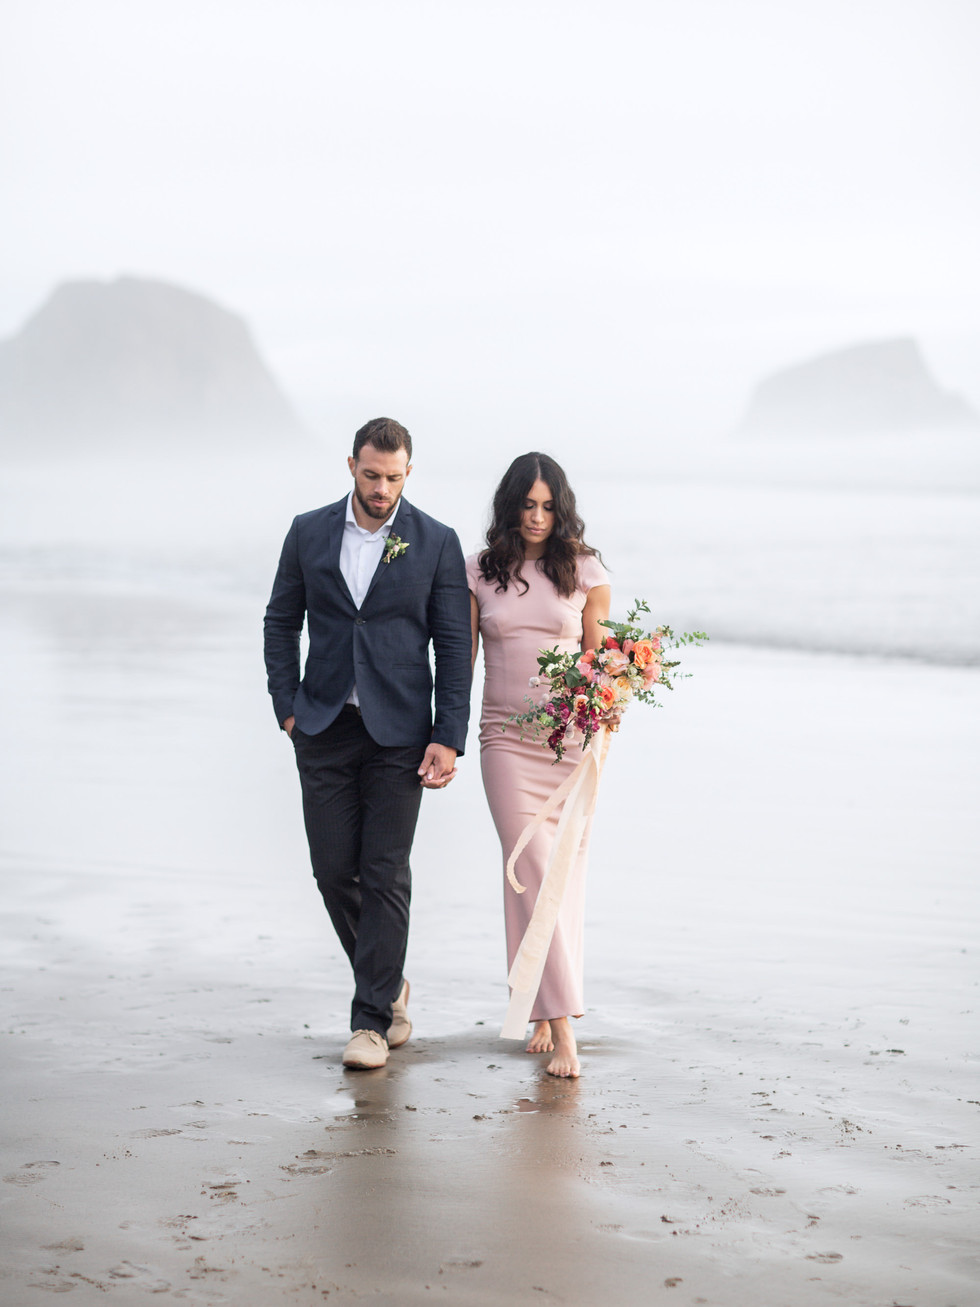 Cannon Beach Engagement Session Fine Art Wedding PPhotographer MacCoy Dean